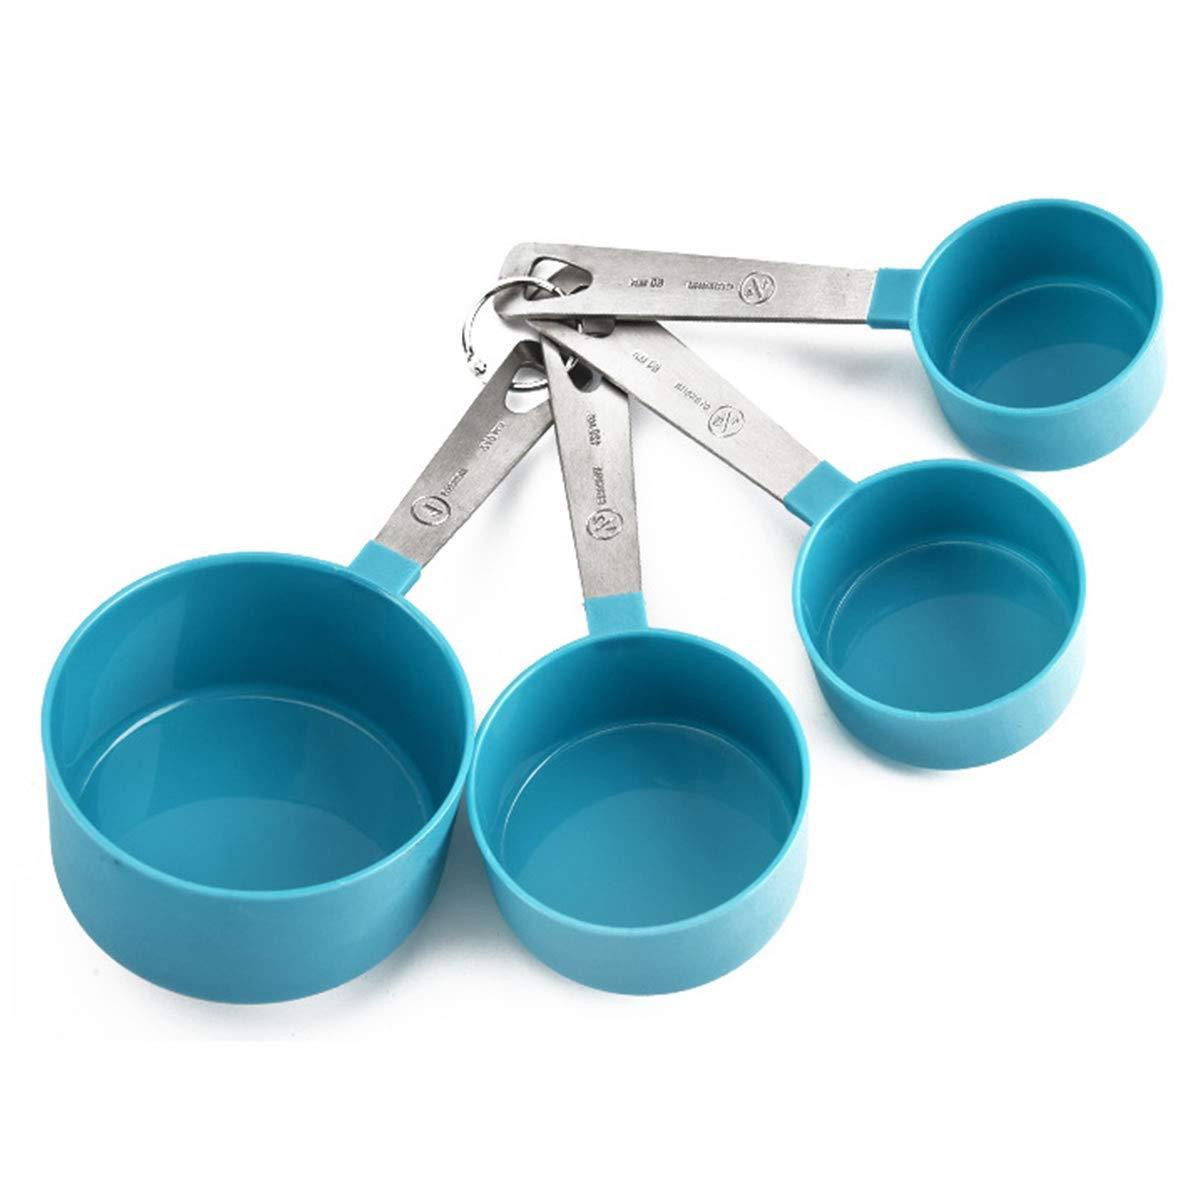 OBR KING 4pcs Measuring Cups Set Kitchen Measuring Tools Liquid Dry Ingredients